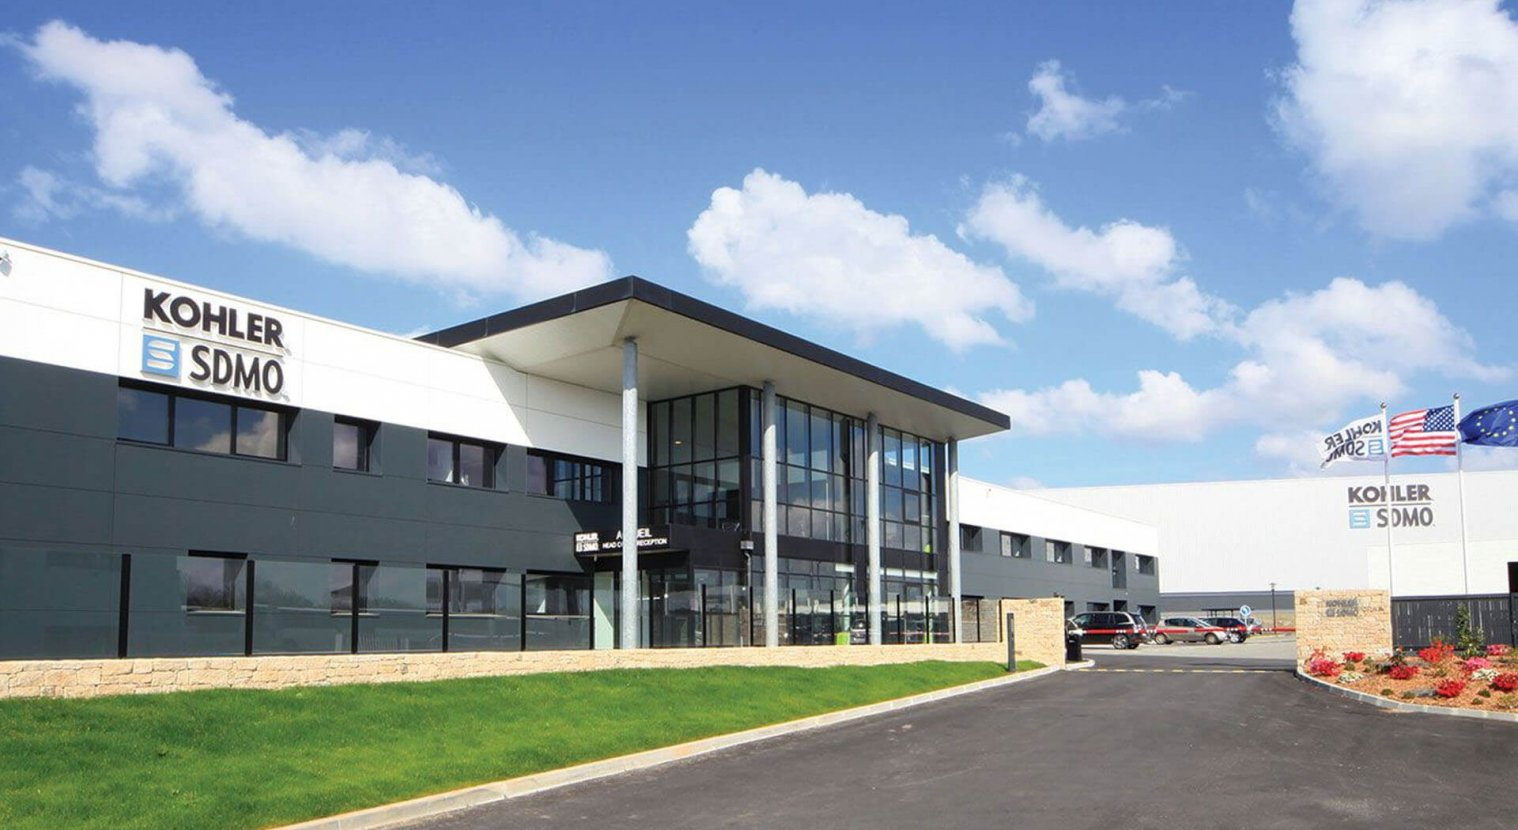 Kohler-SDMO Headquarters